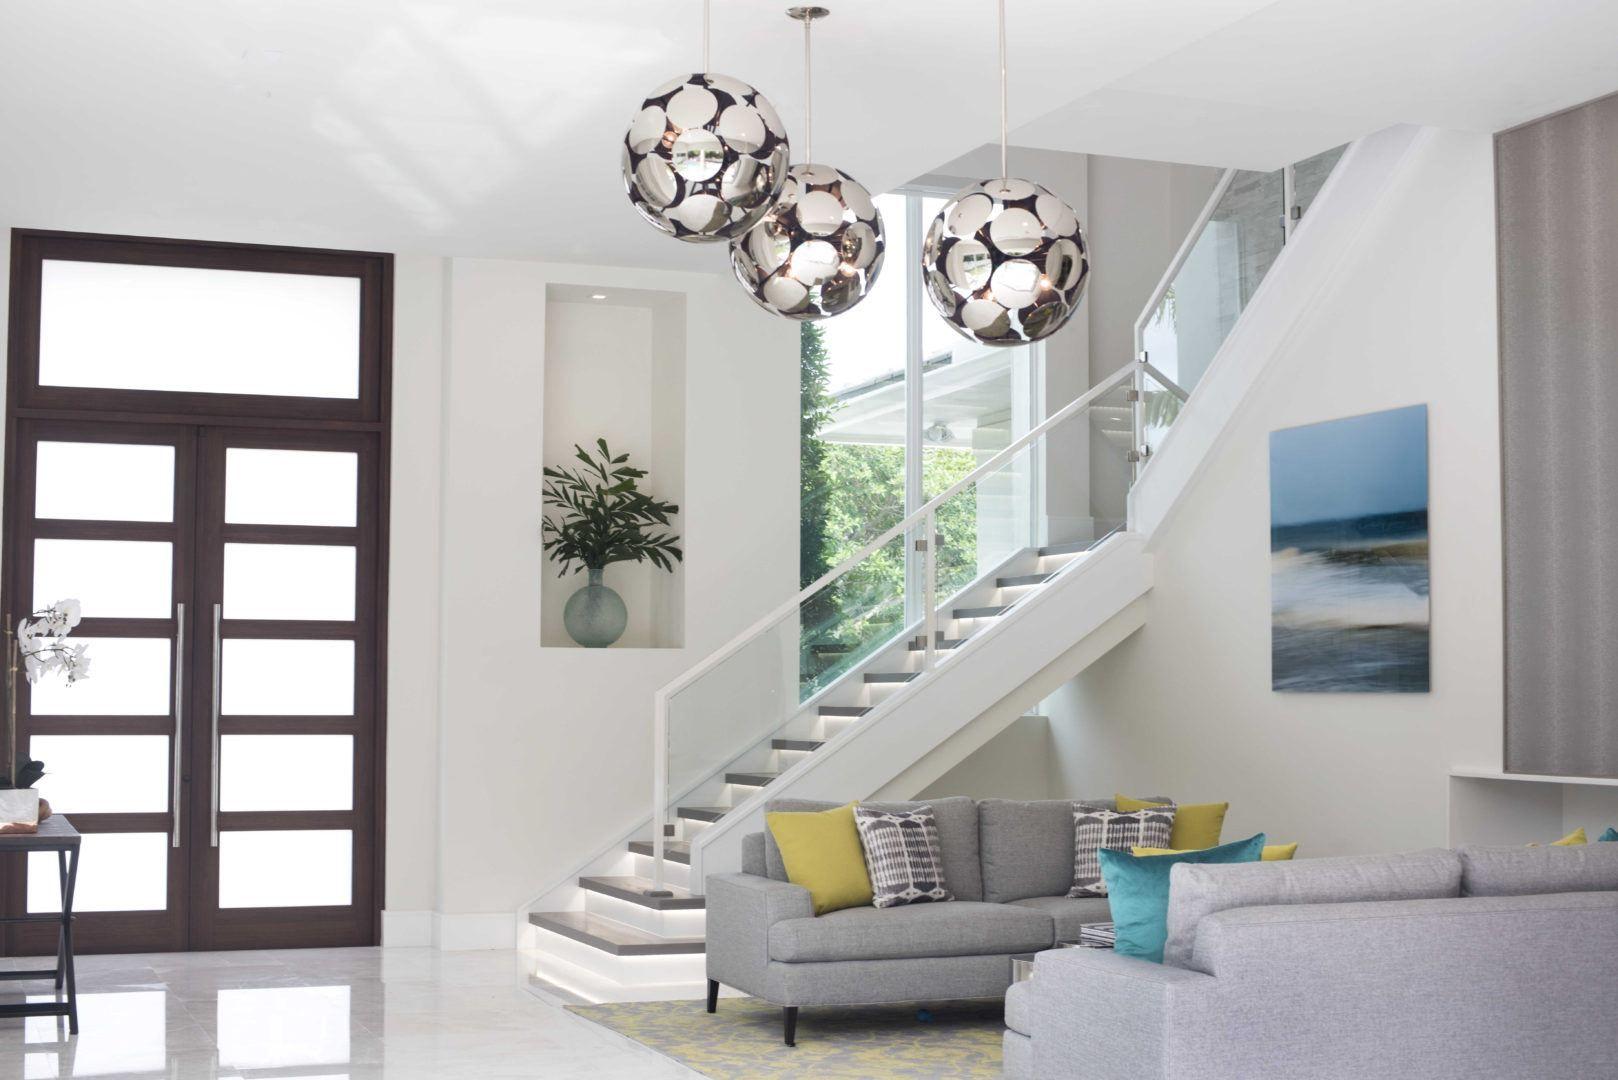 Delray Beach interior design - entrance and home decoration created by interior designer, Olga Adler. #delraybeachinteriordesign #floridainteriors #homedecor #delraybeach #florida